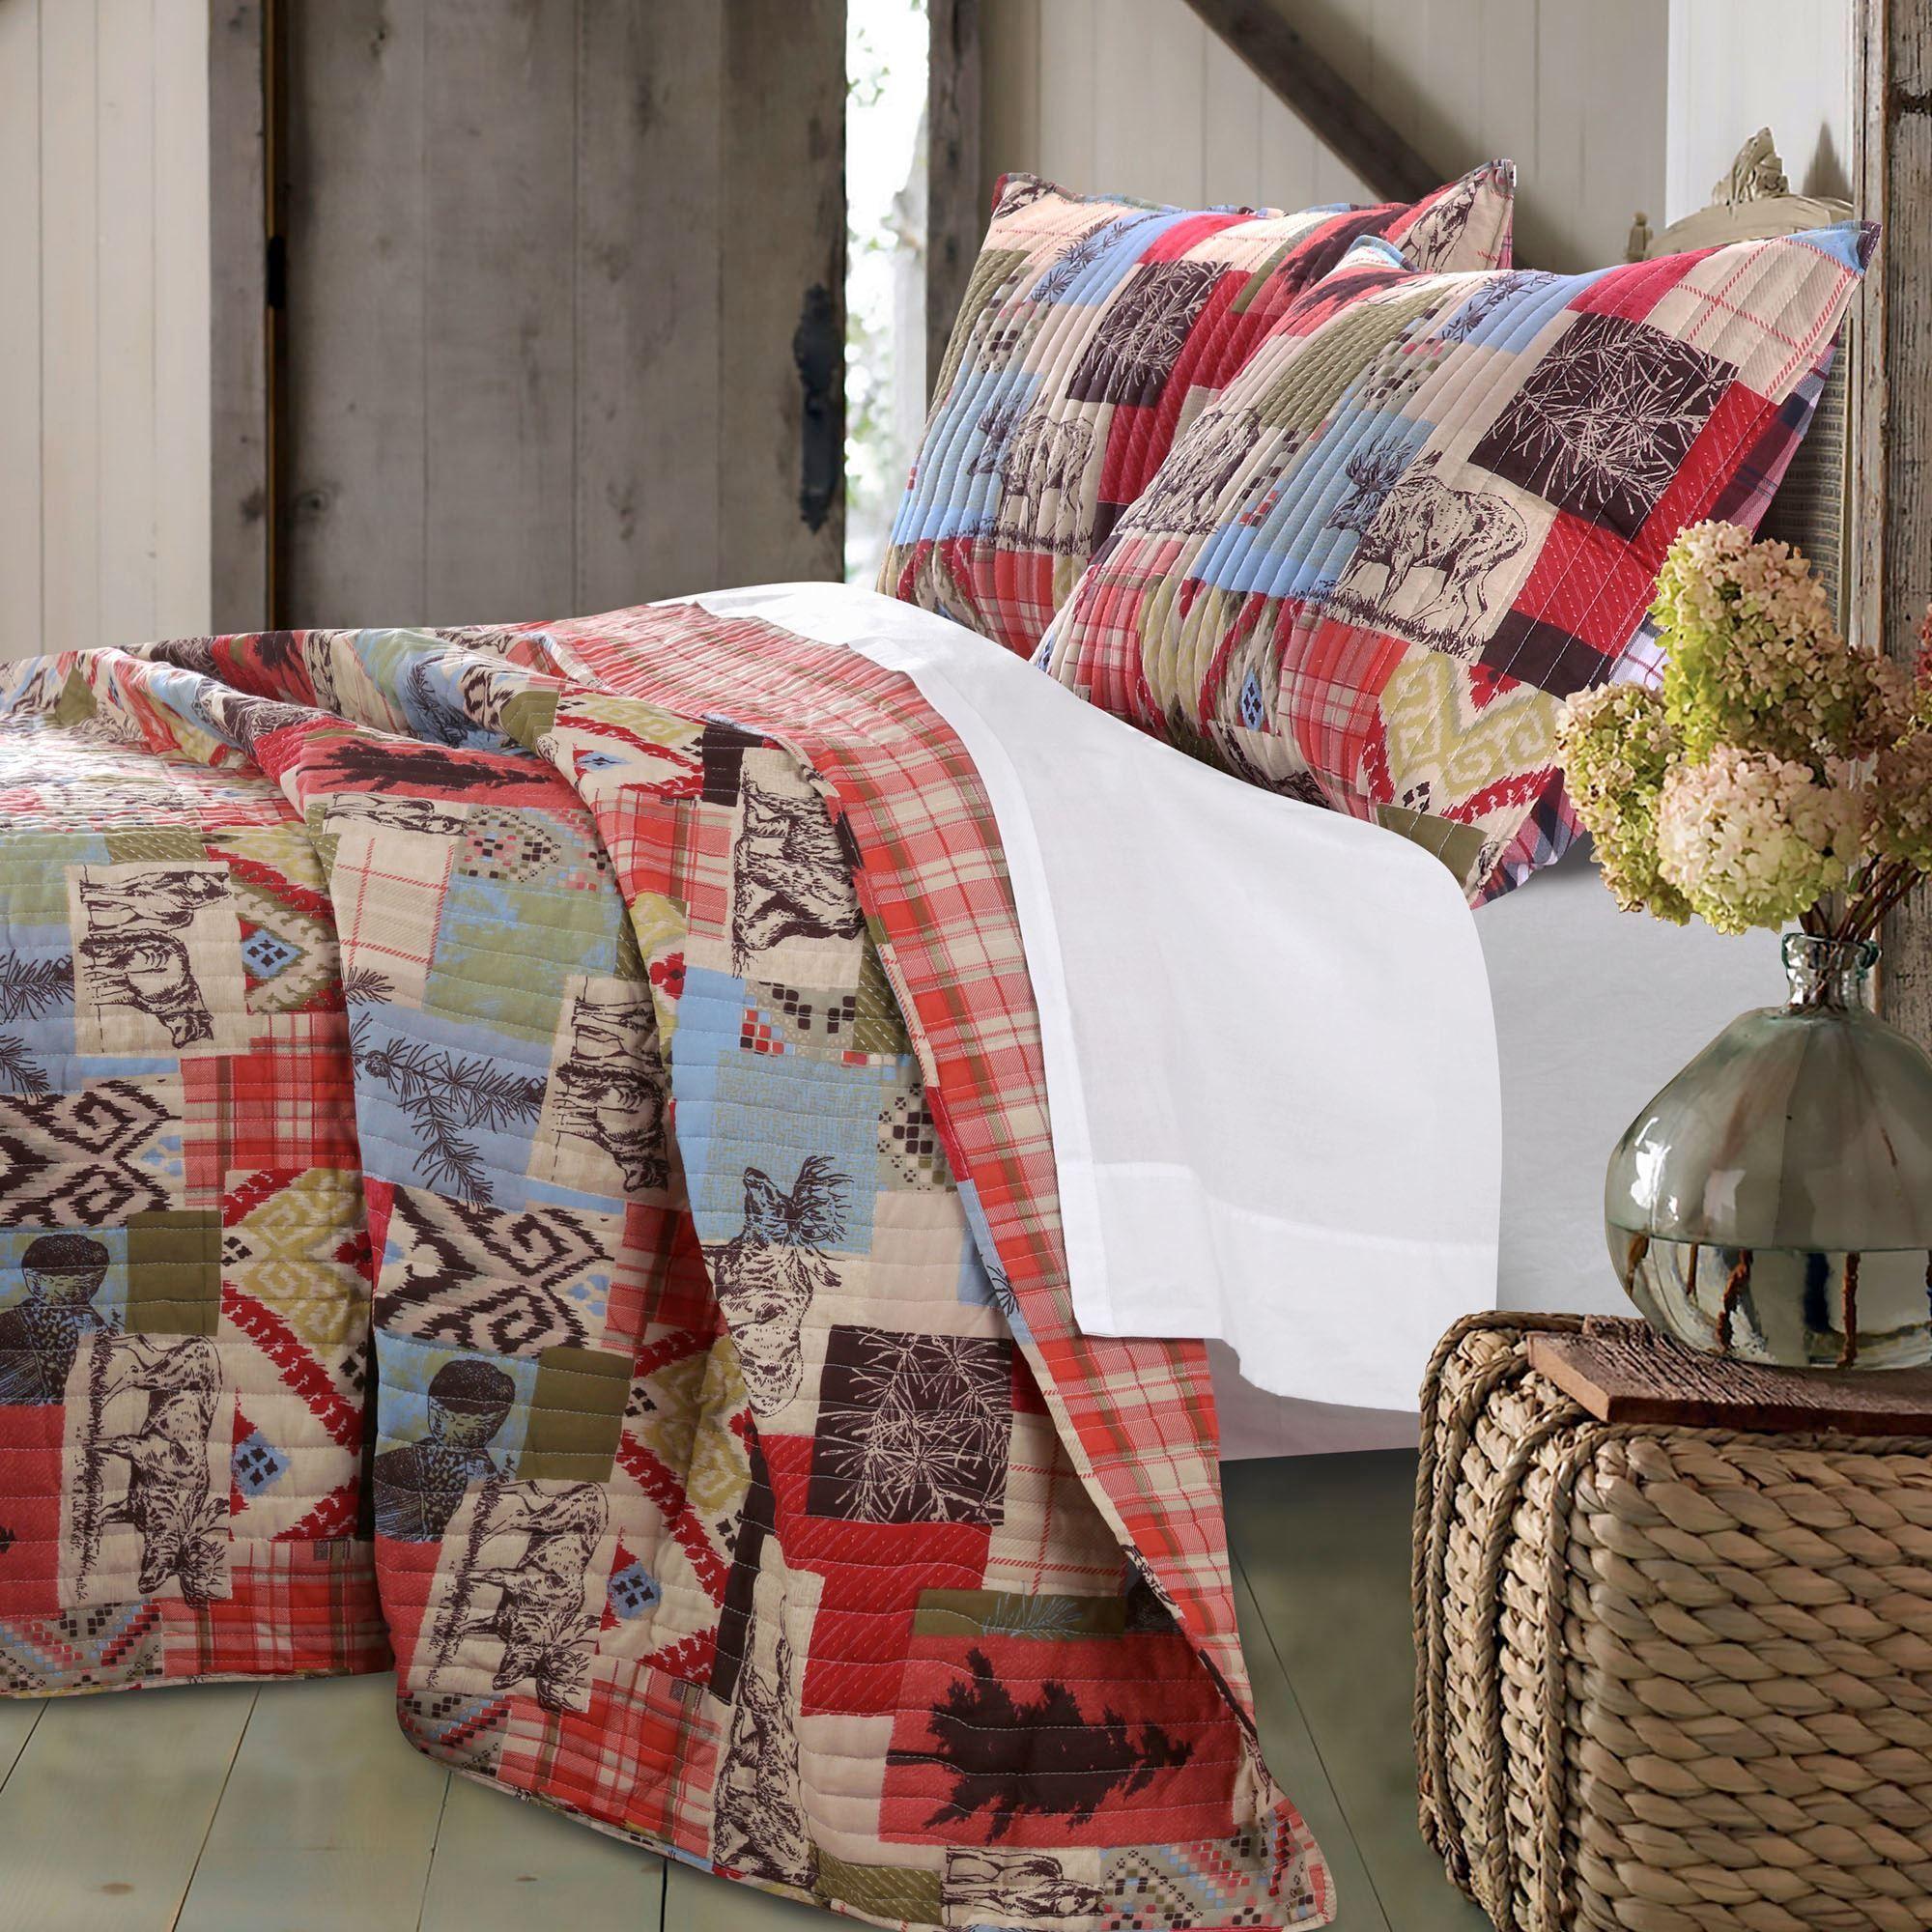 Rustic Lodge Bear and Moose Quilt Set : moose lodge quilt set - Adamdwight.com